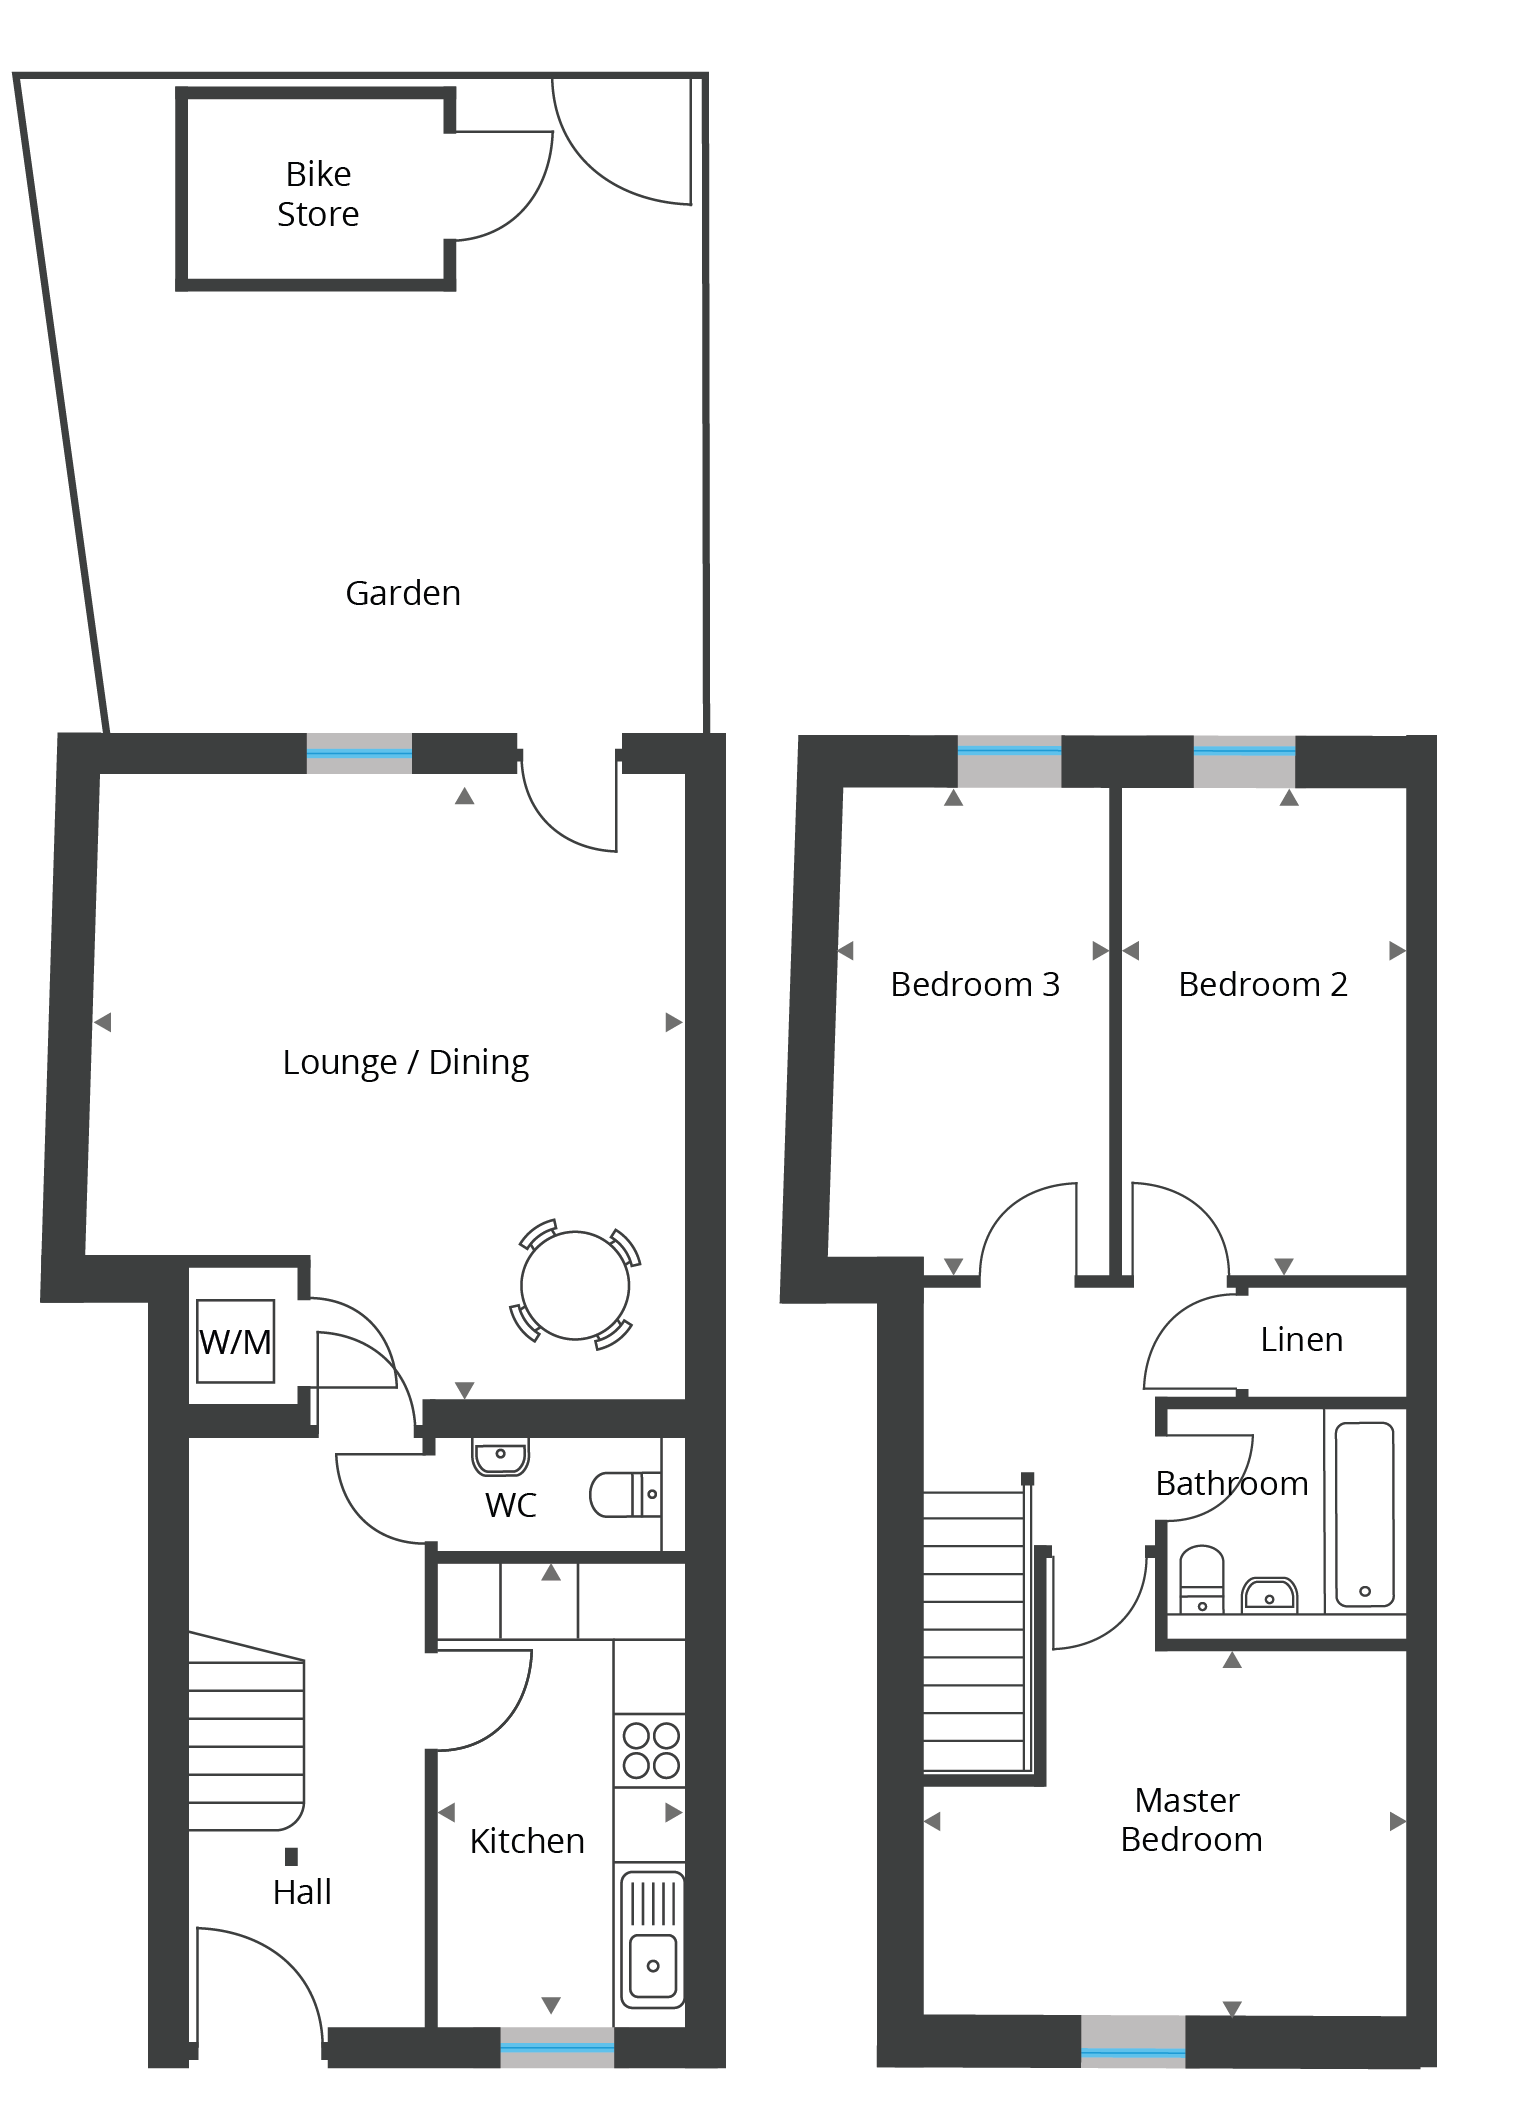 Floorplan for Unit 11